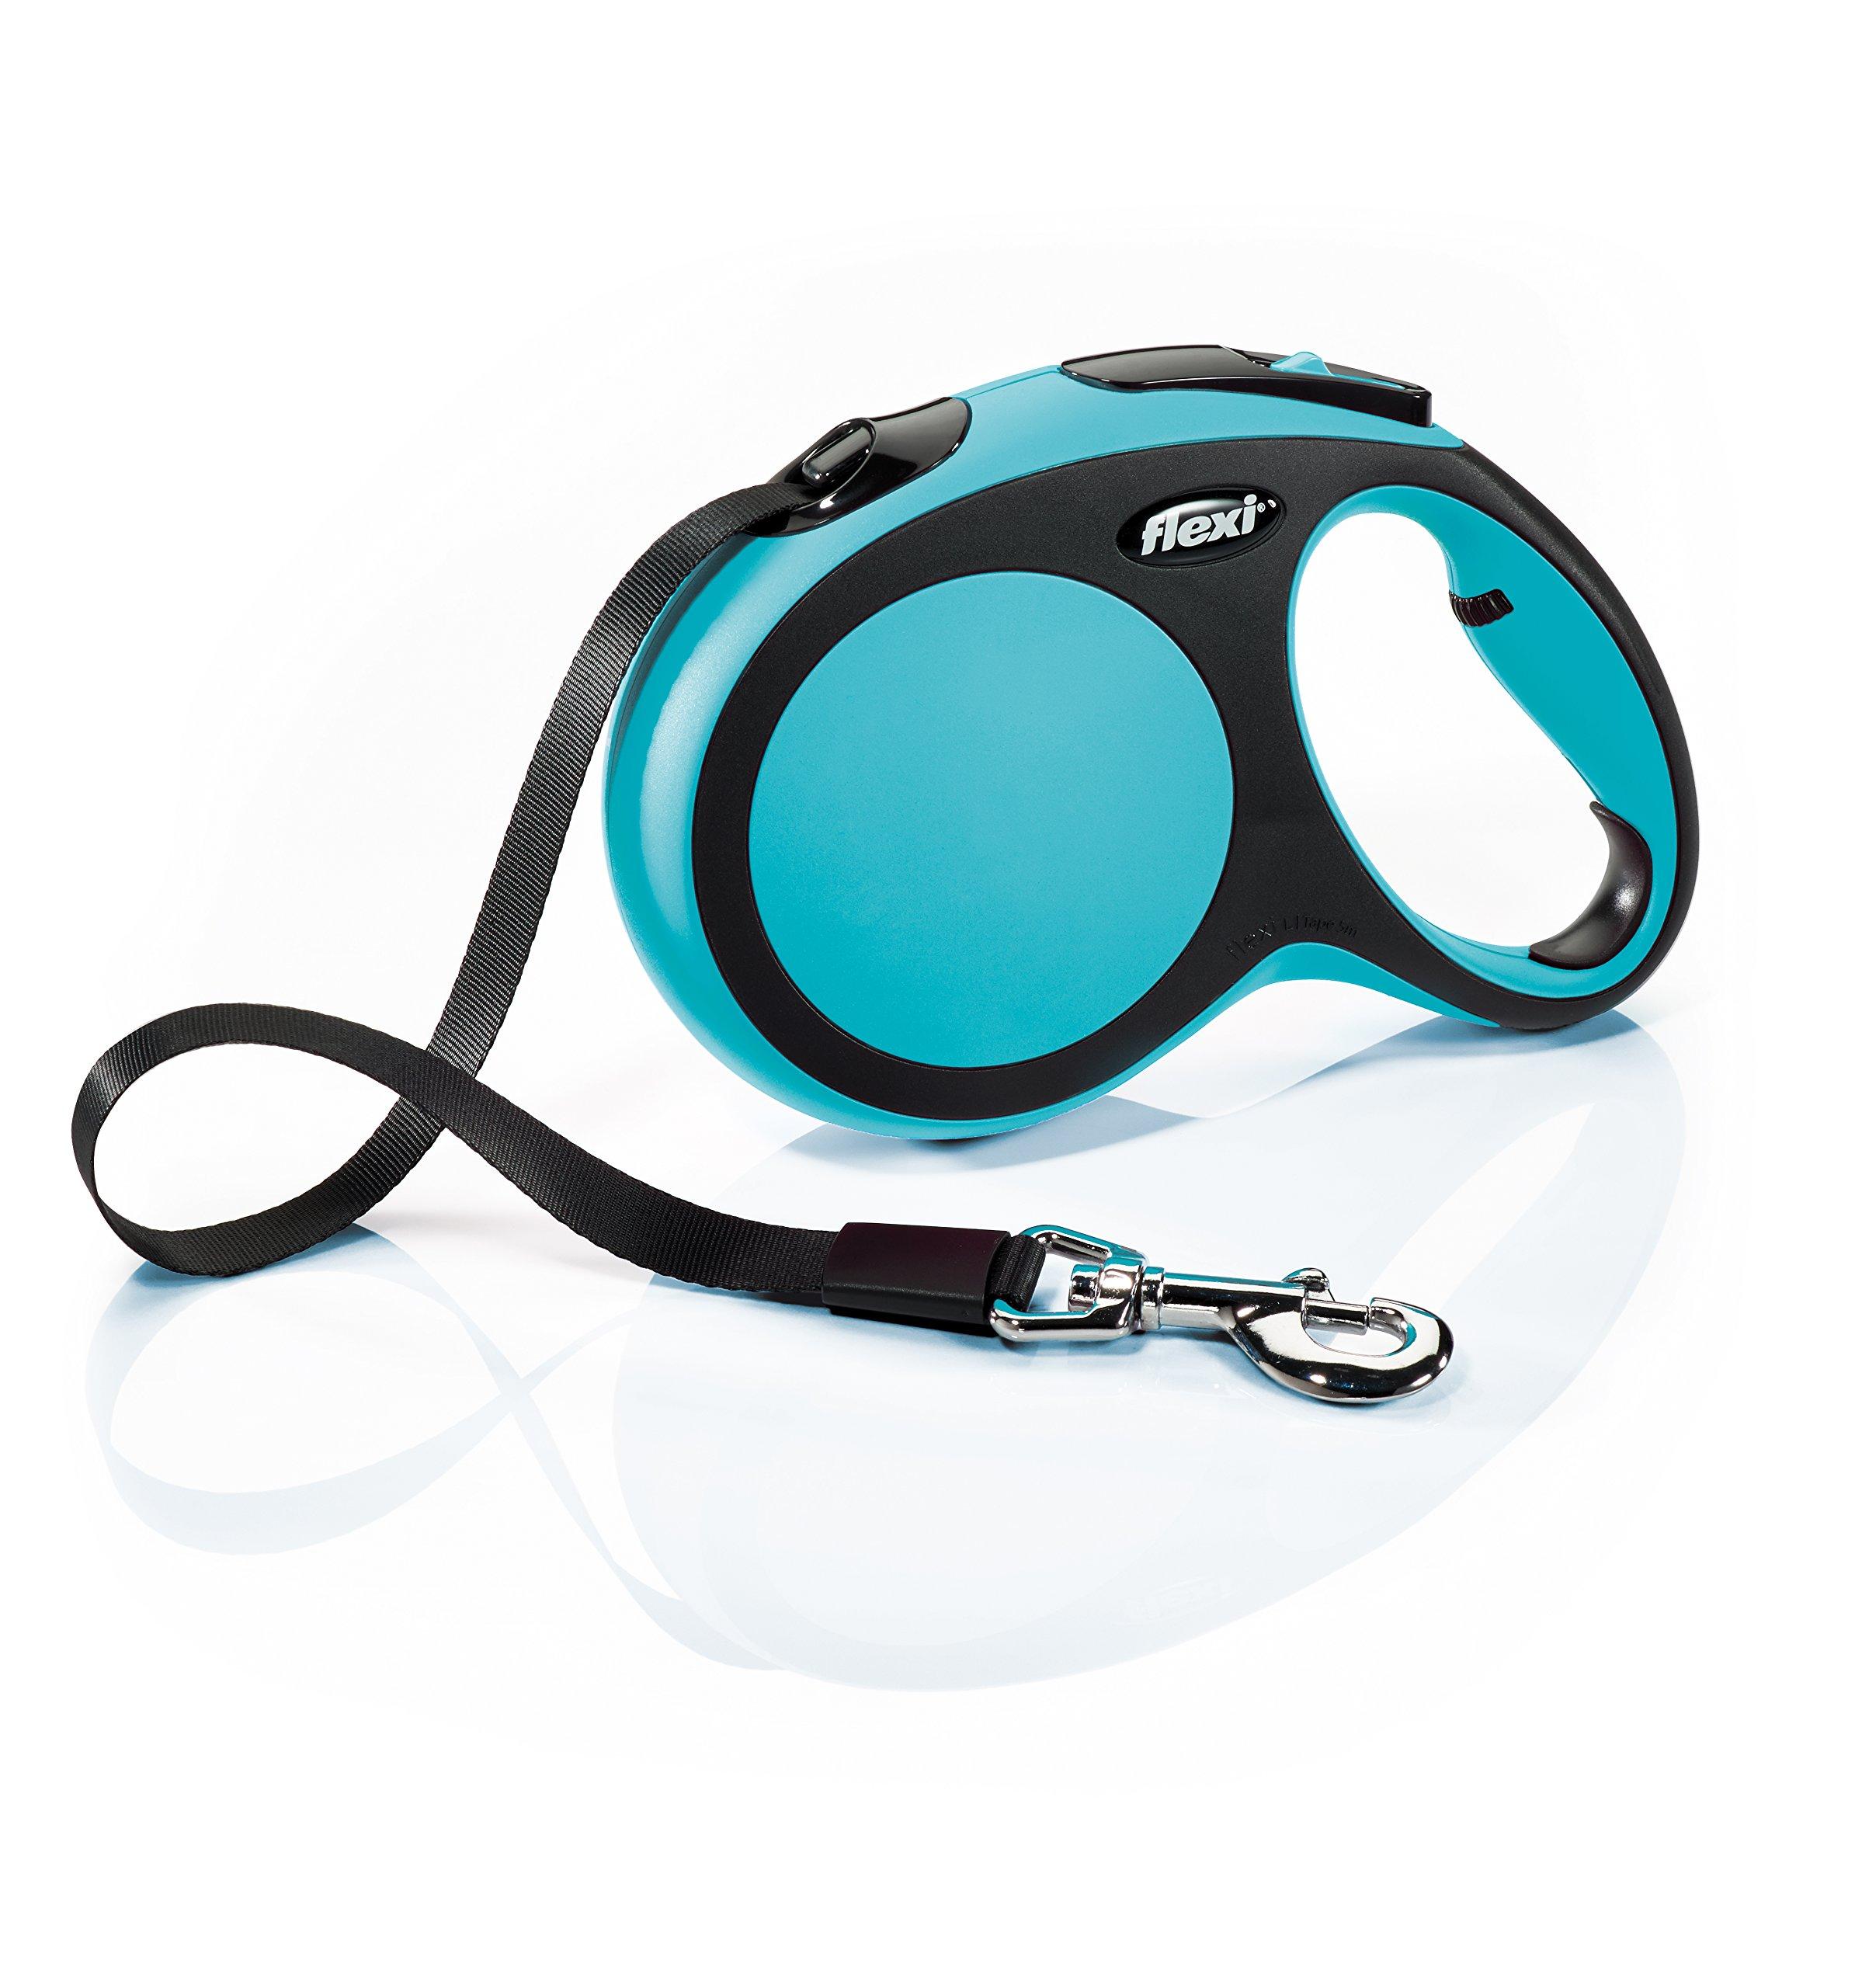 Flexi New Comfort Retractable Dog Leash (Tape), 16 ft, Large, Blue by Flexi